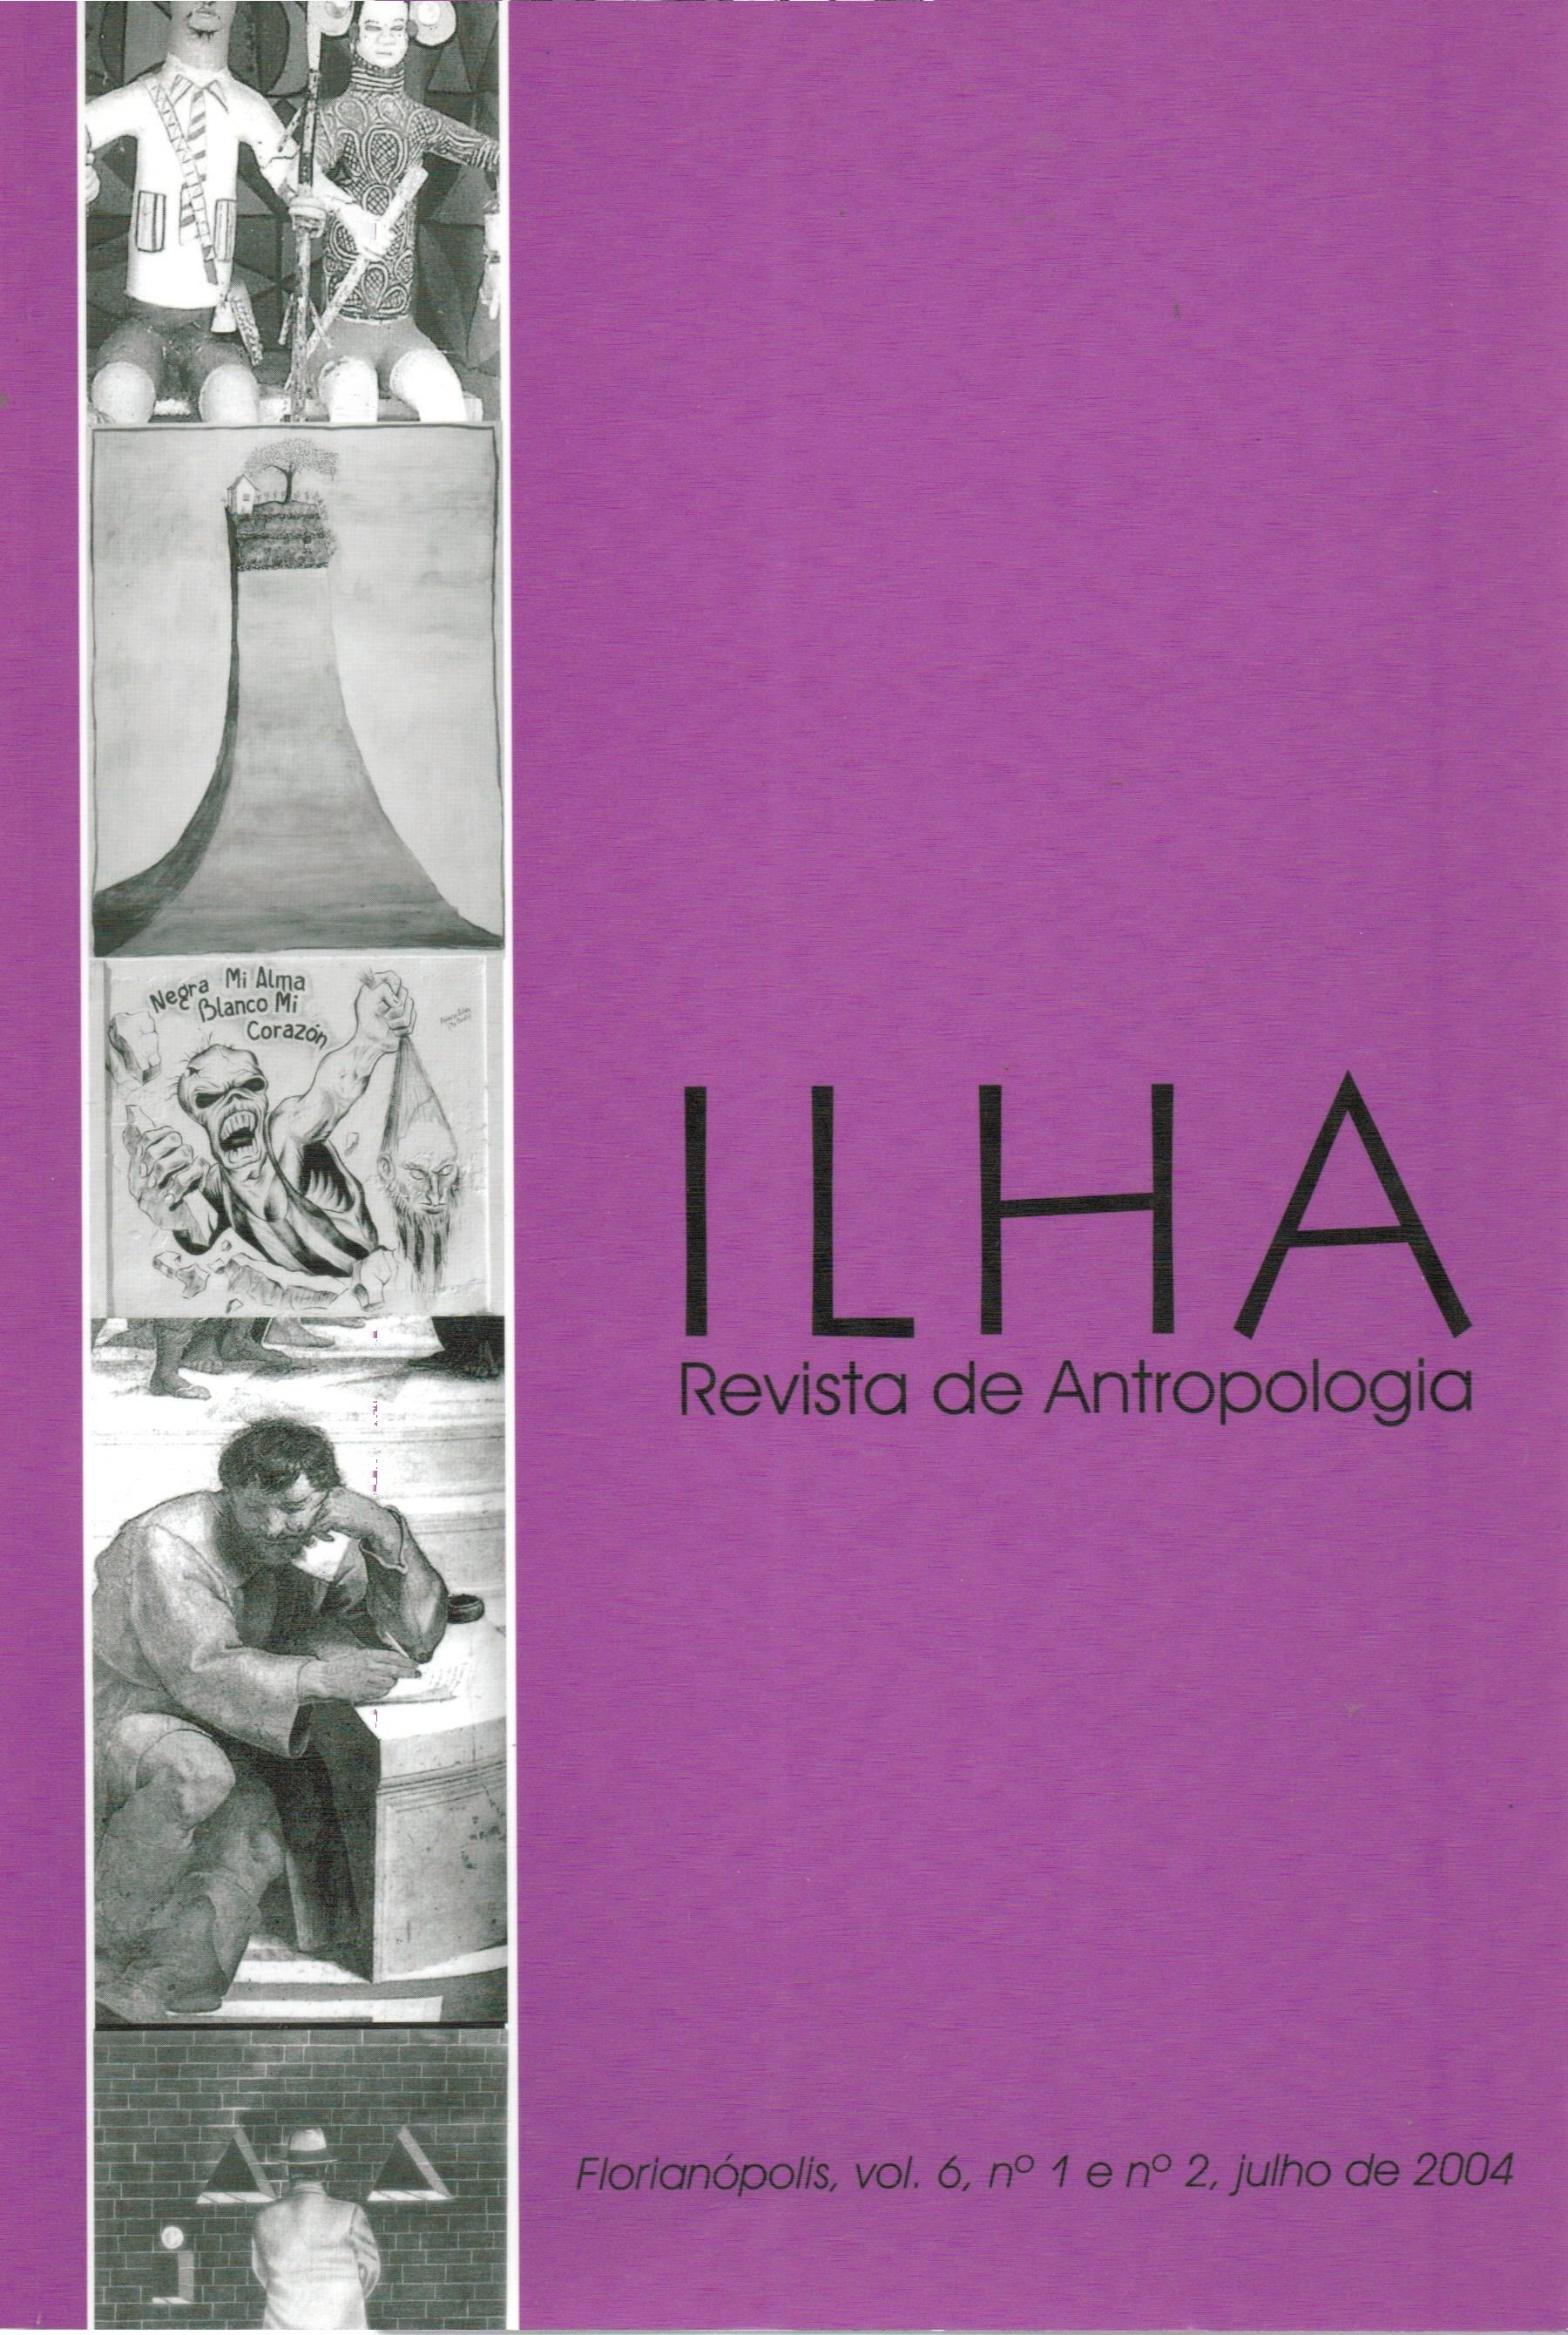 Editora deste volume: Professora Doutora Carmen Silvia Moraes Rial